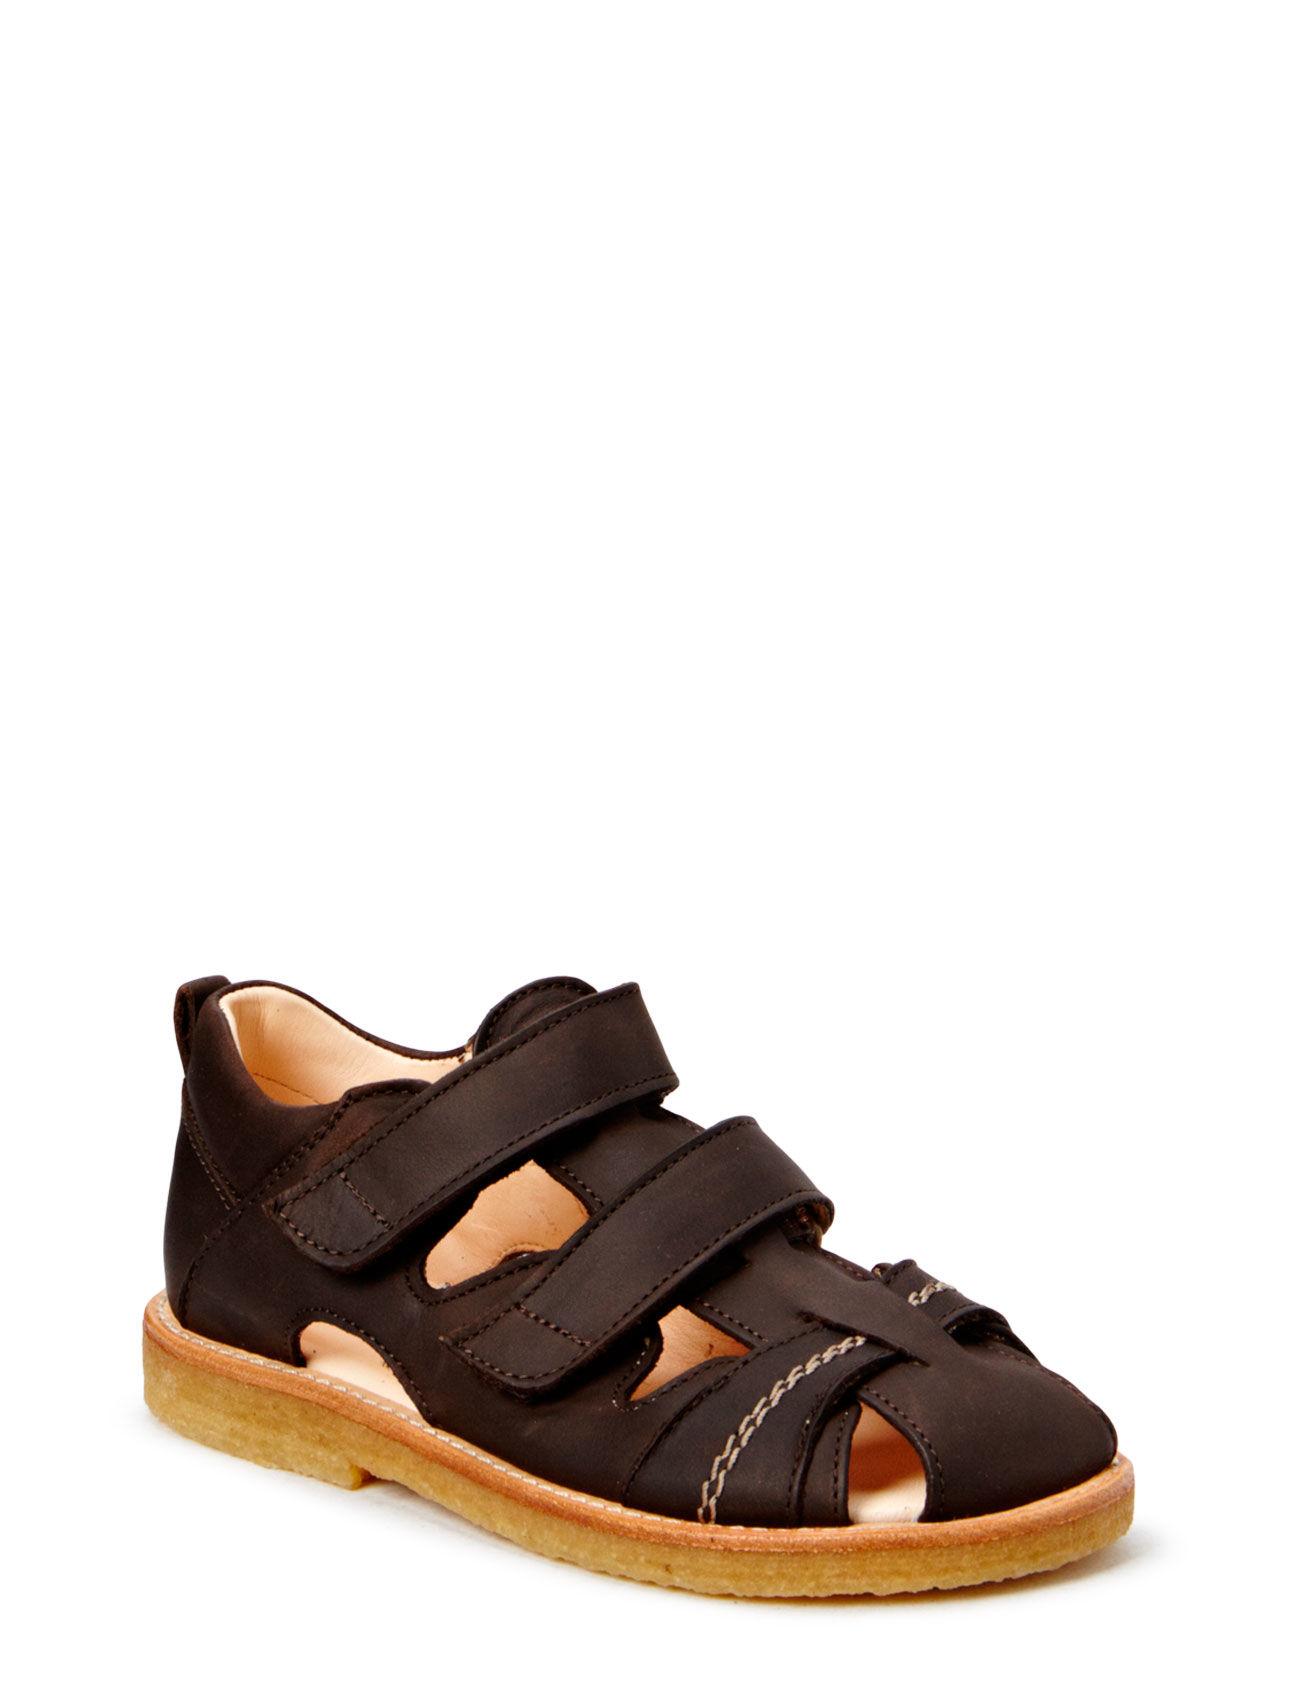 Sandal with 2 velcro closures fra angulus på boozt.com dk